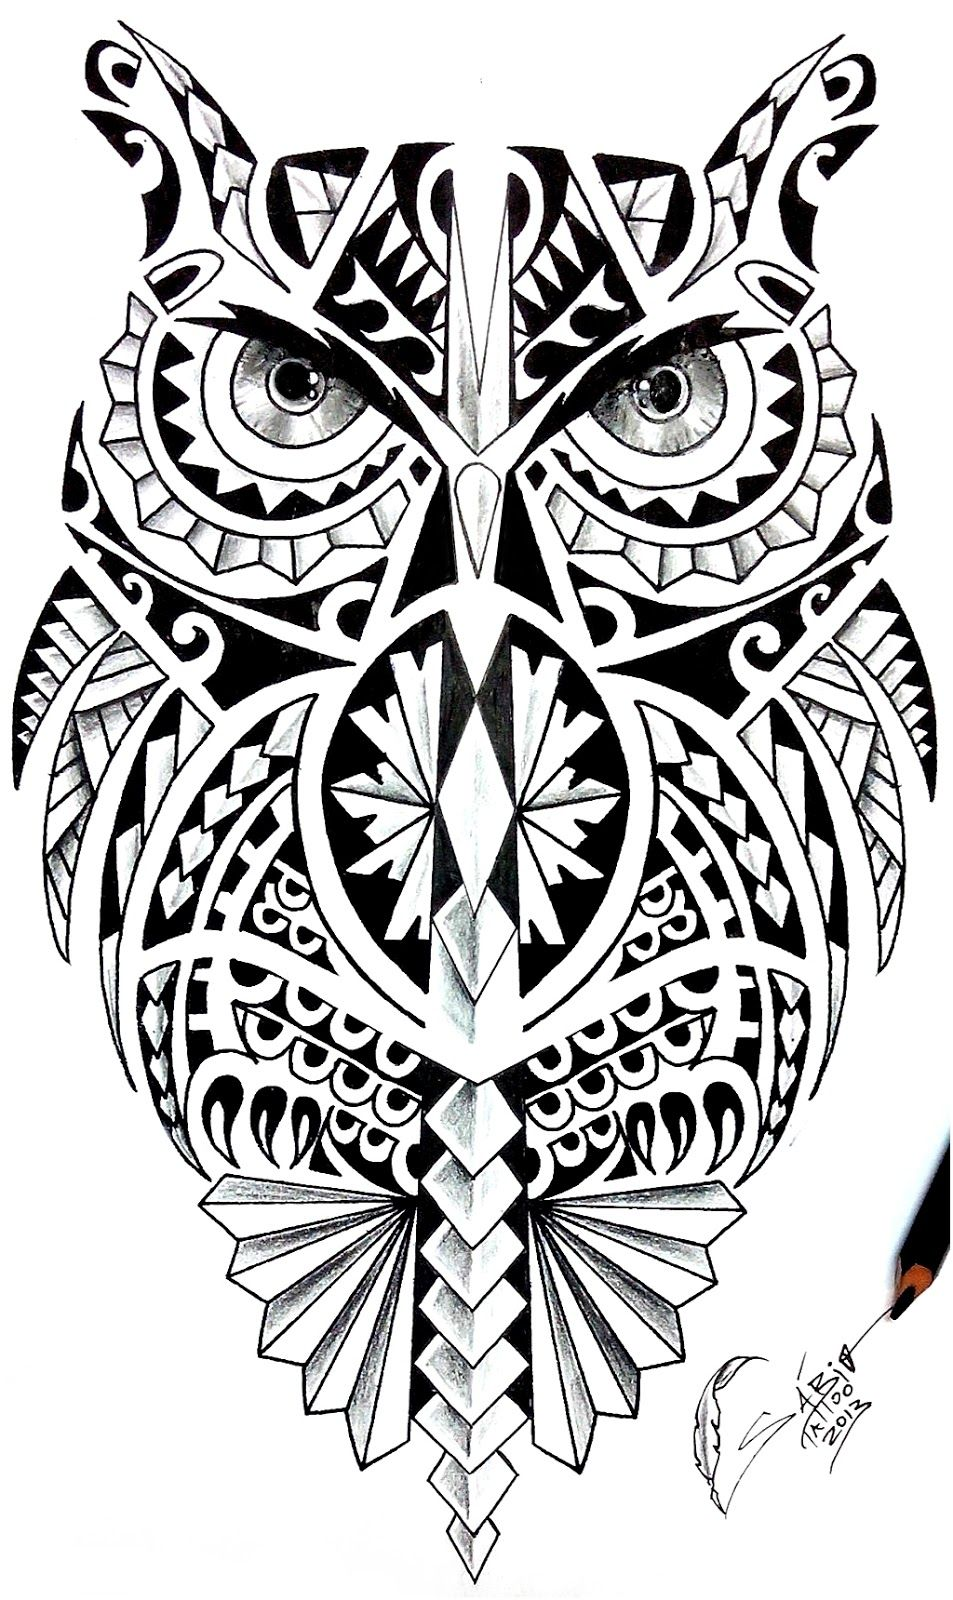 Sabio Tattoo Tatuagem Profissional Sabio Tattoo Desenhando Maori - Dibujos-maoris